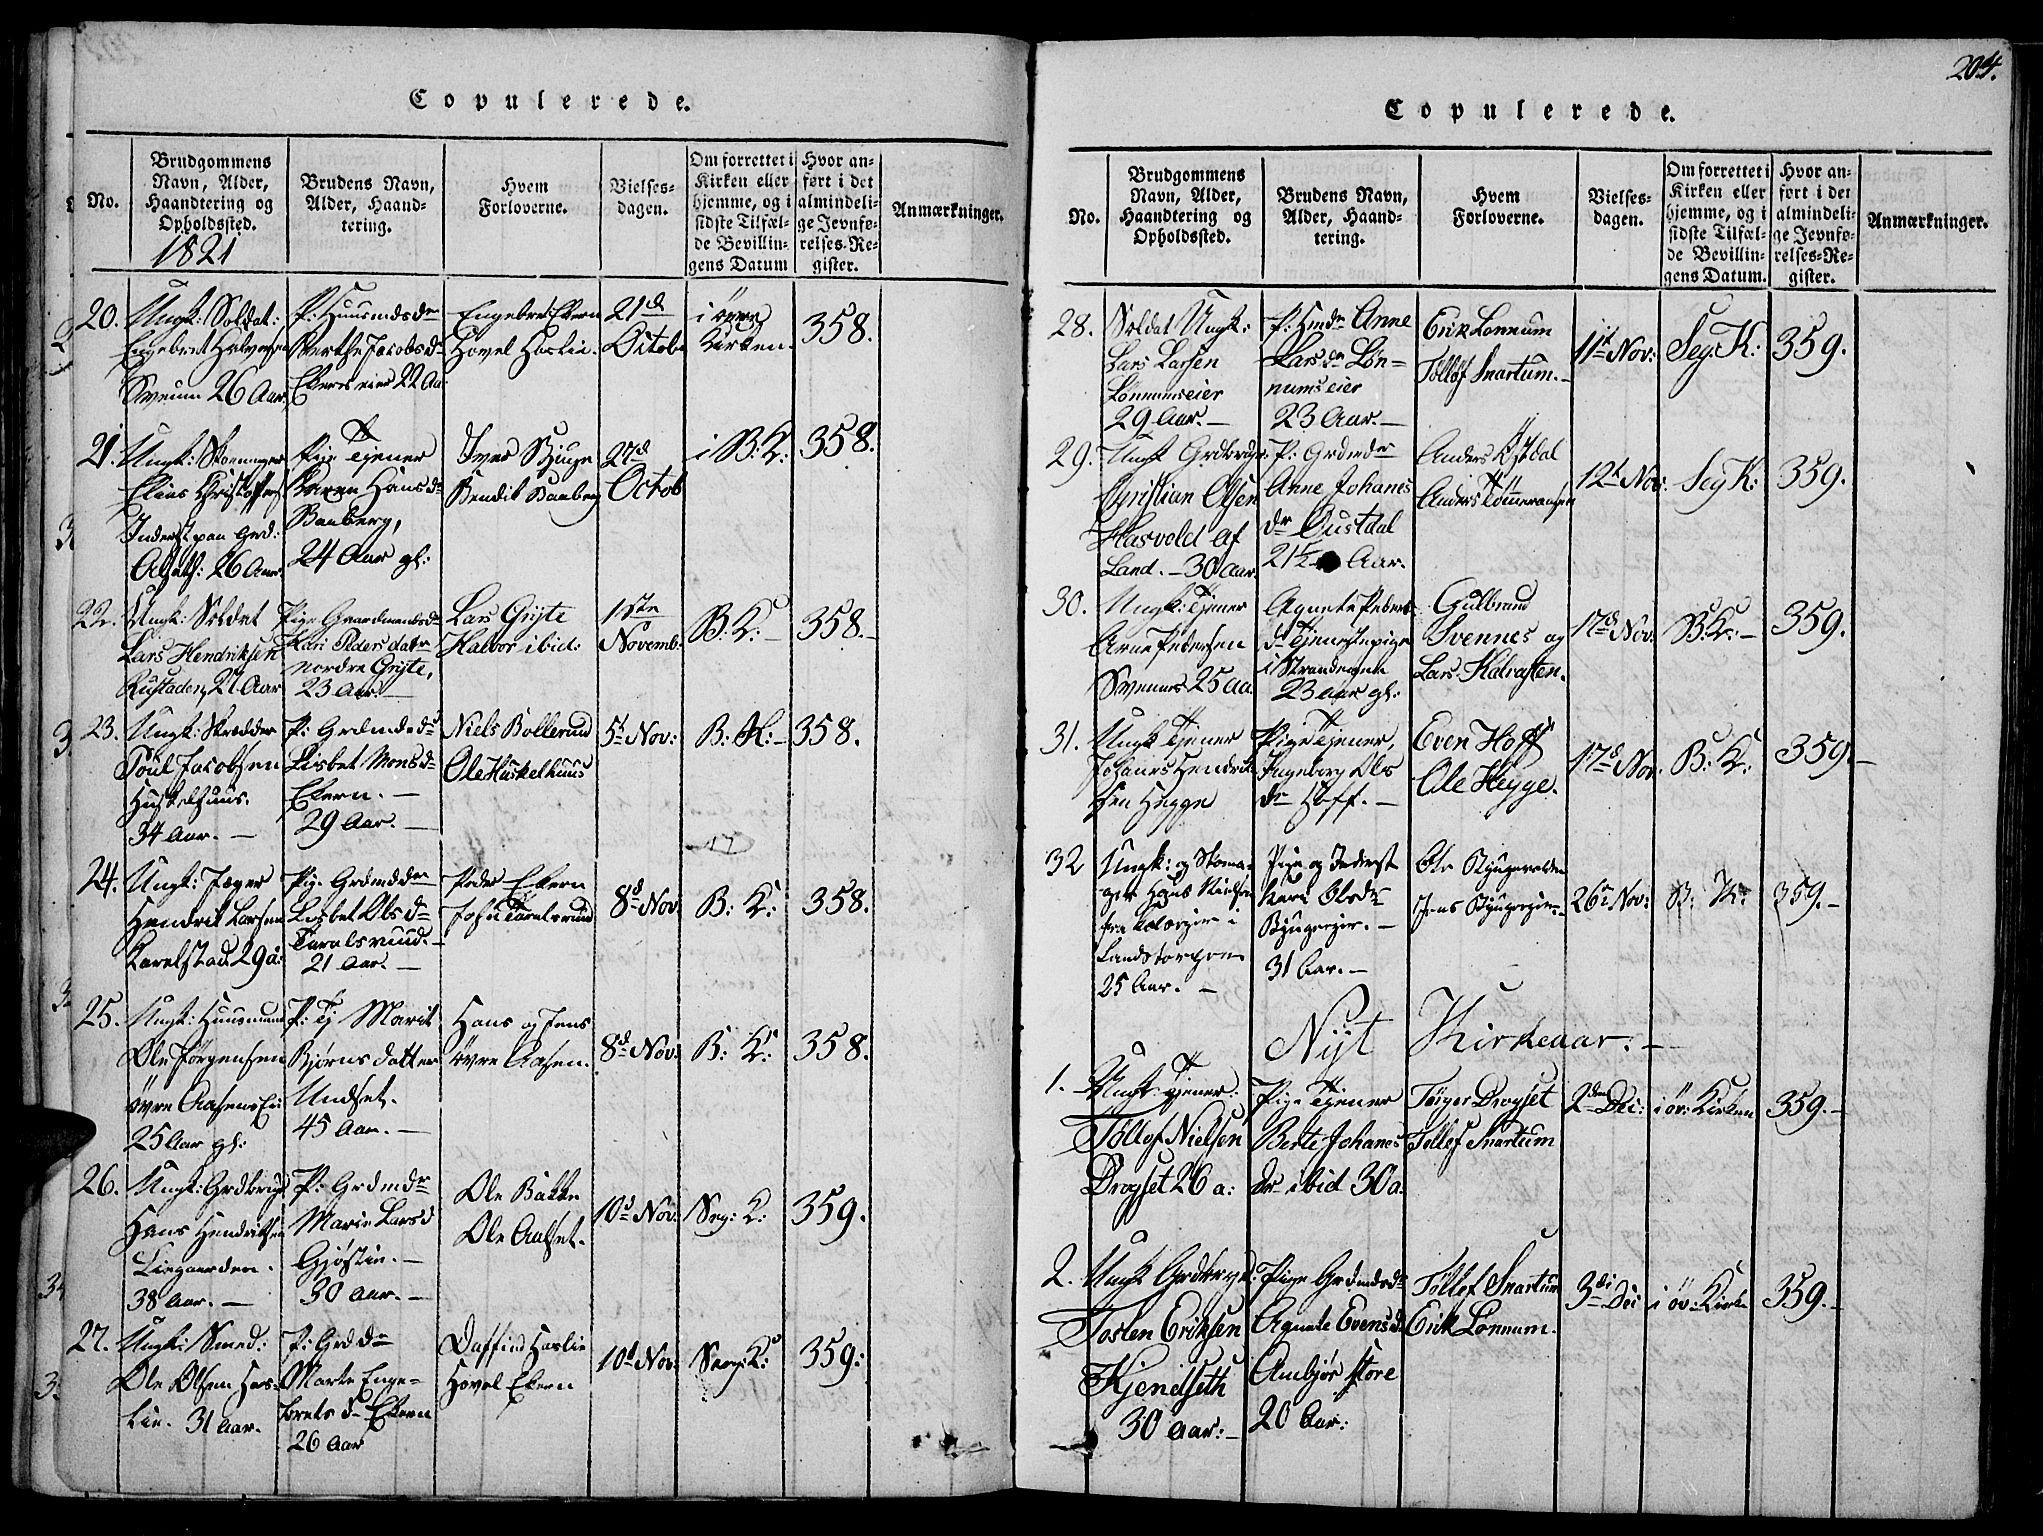 SAH, Biri prestekontor, Ministerialbok nr. 3, 1814-1828, s. 204